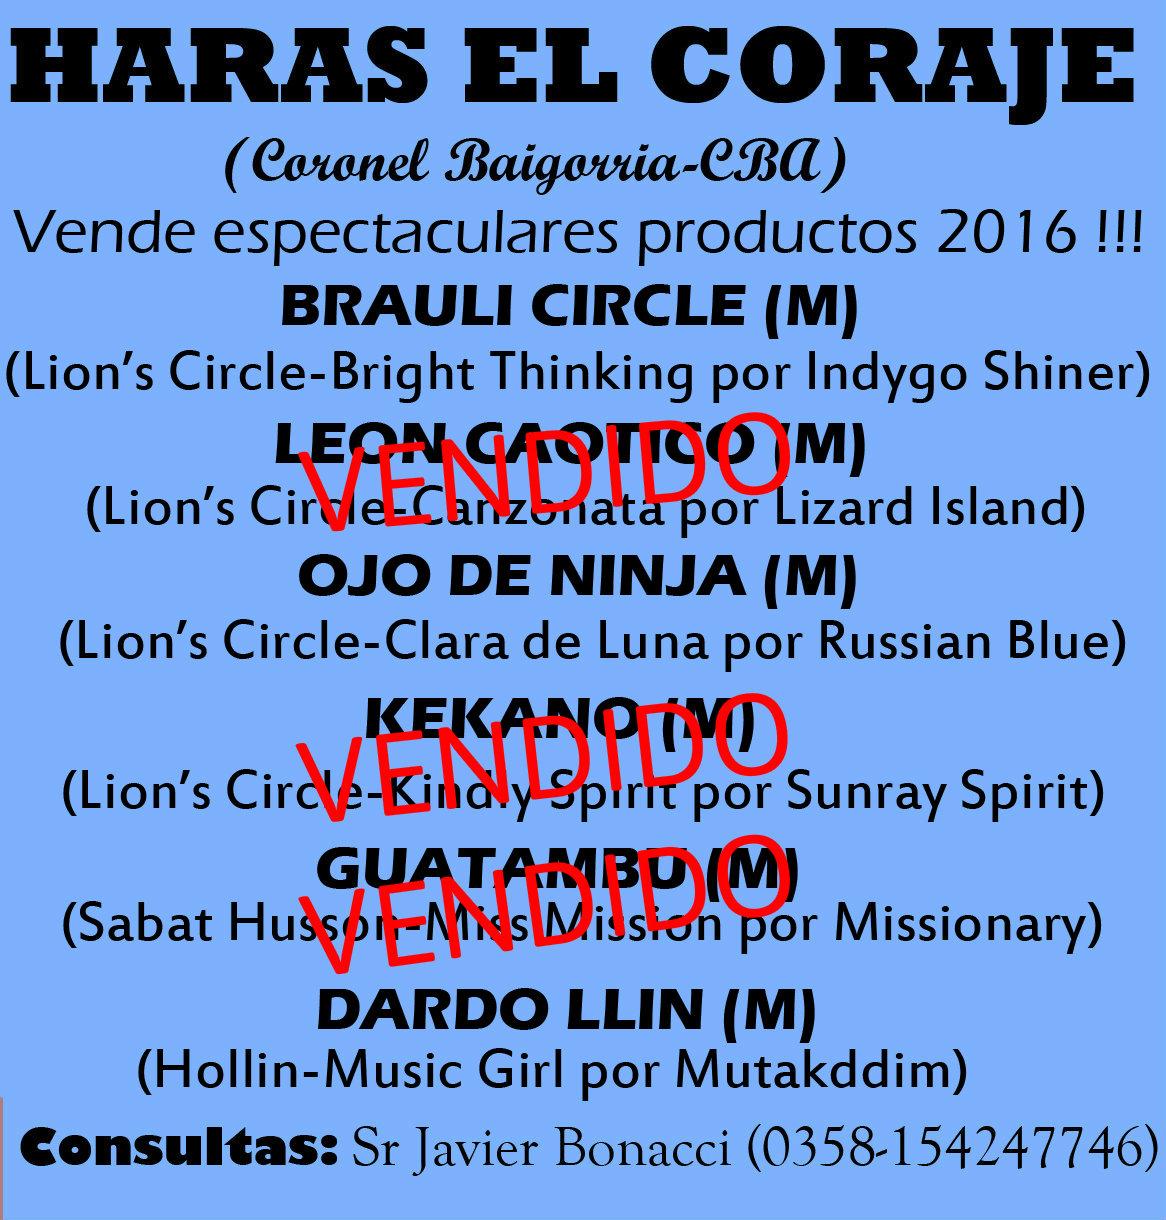 HS EL CORAJE 1E